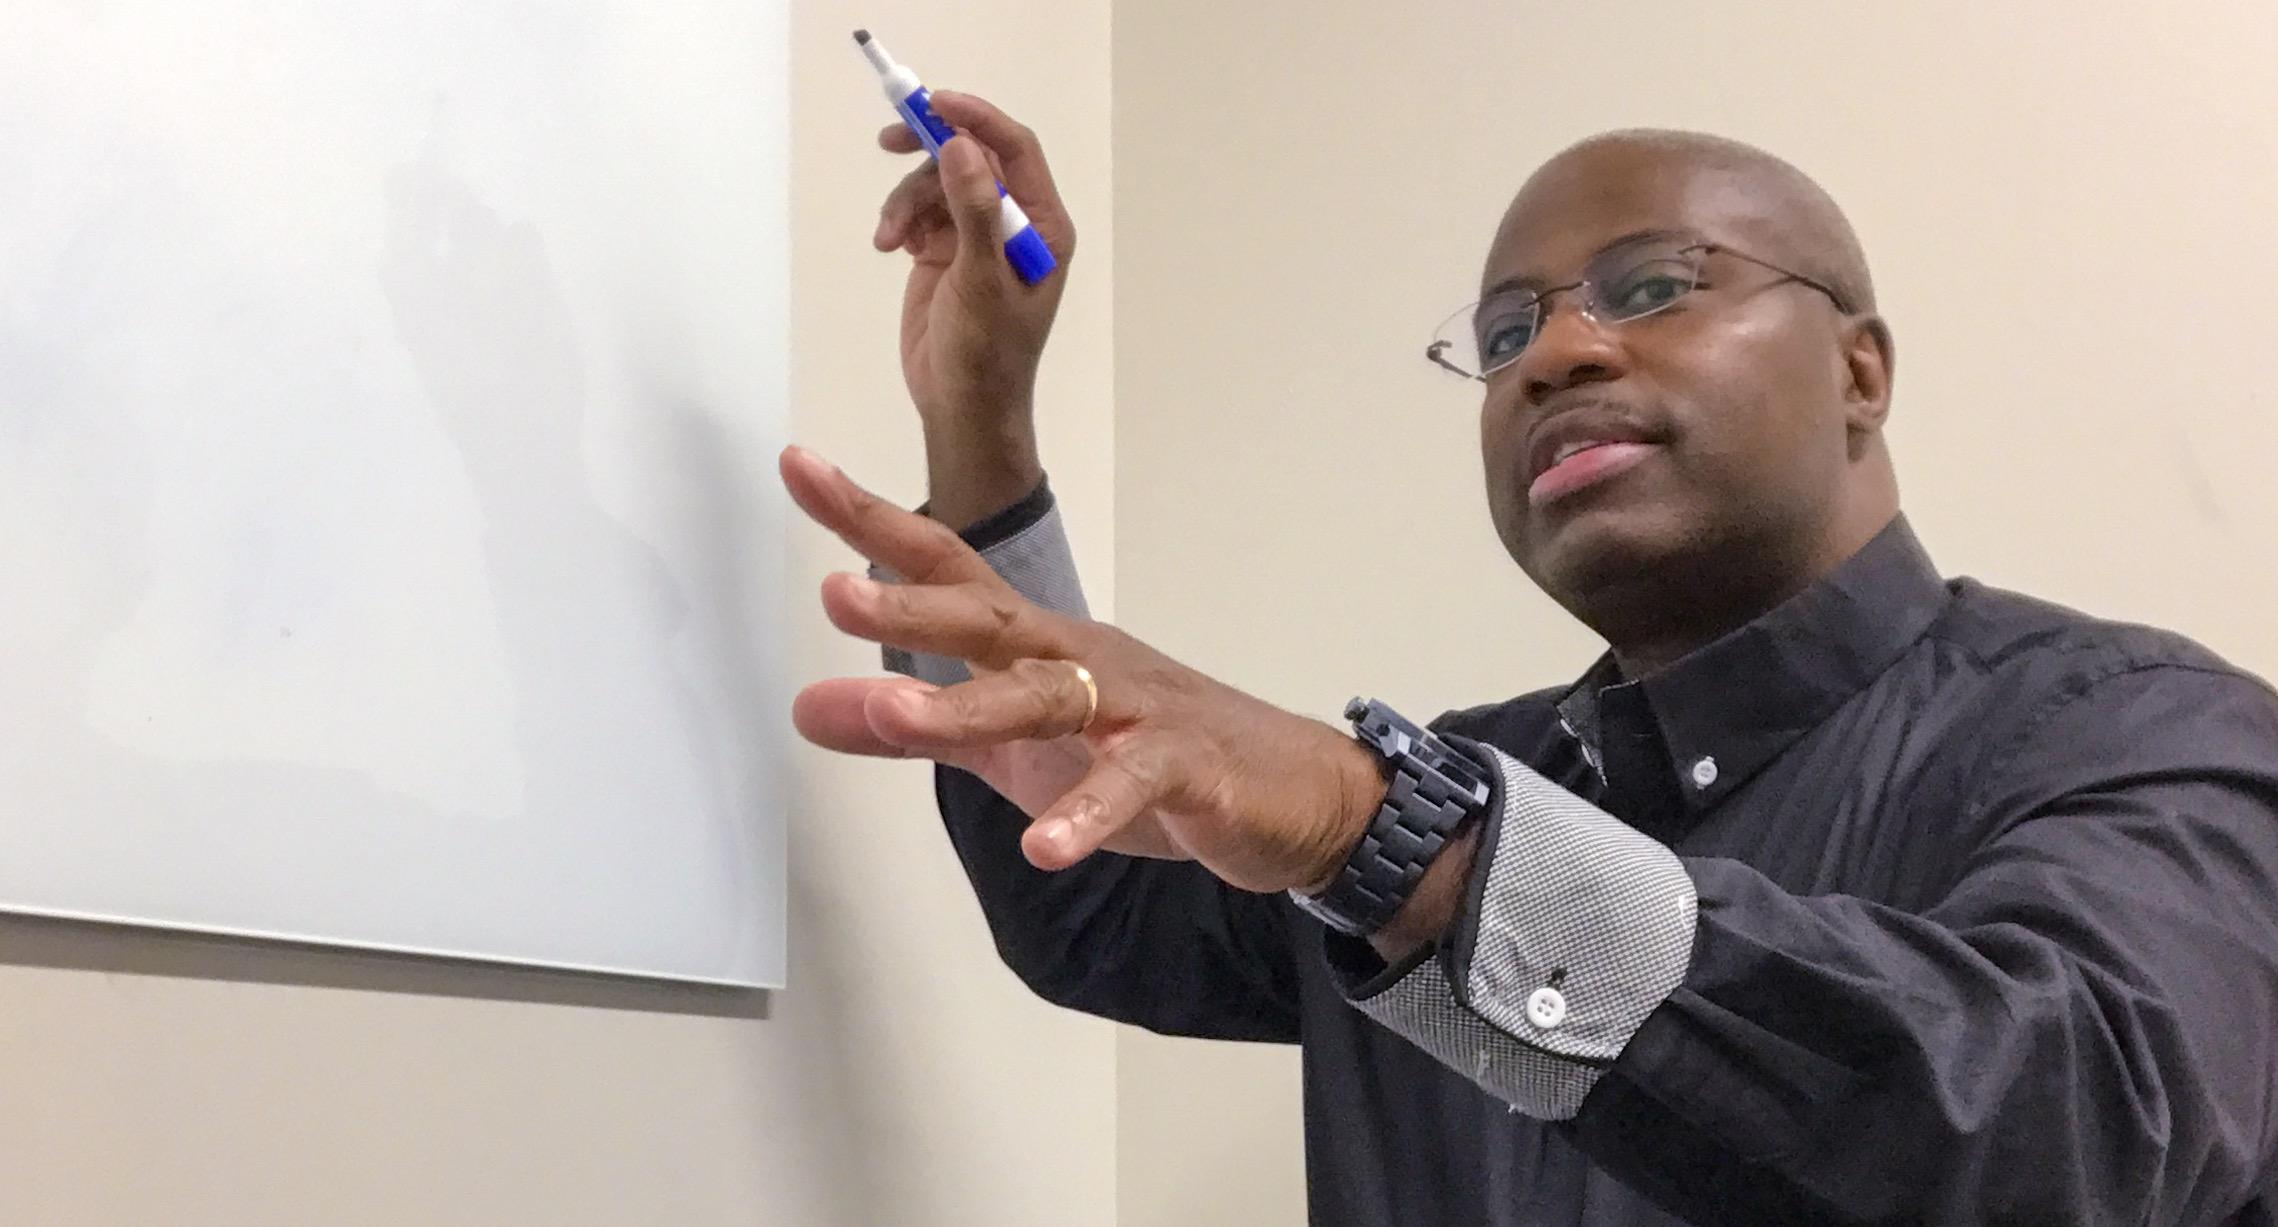 Warith Niallah giving task force directions